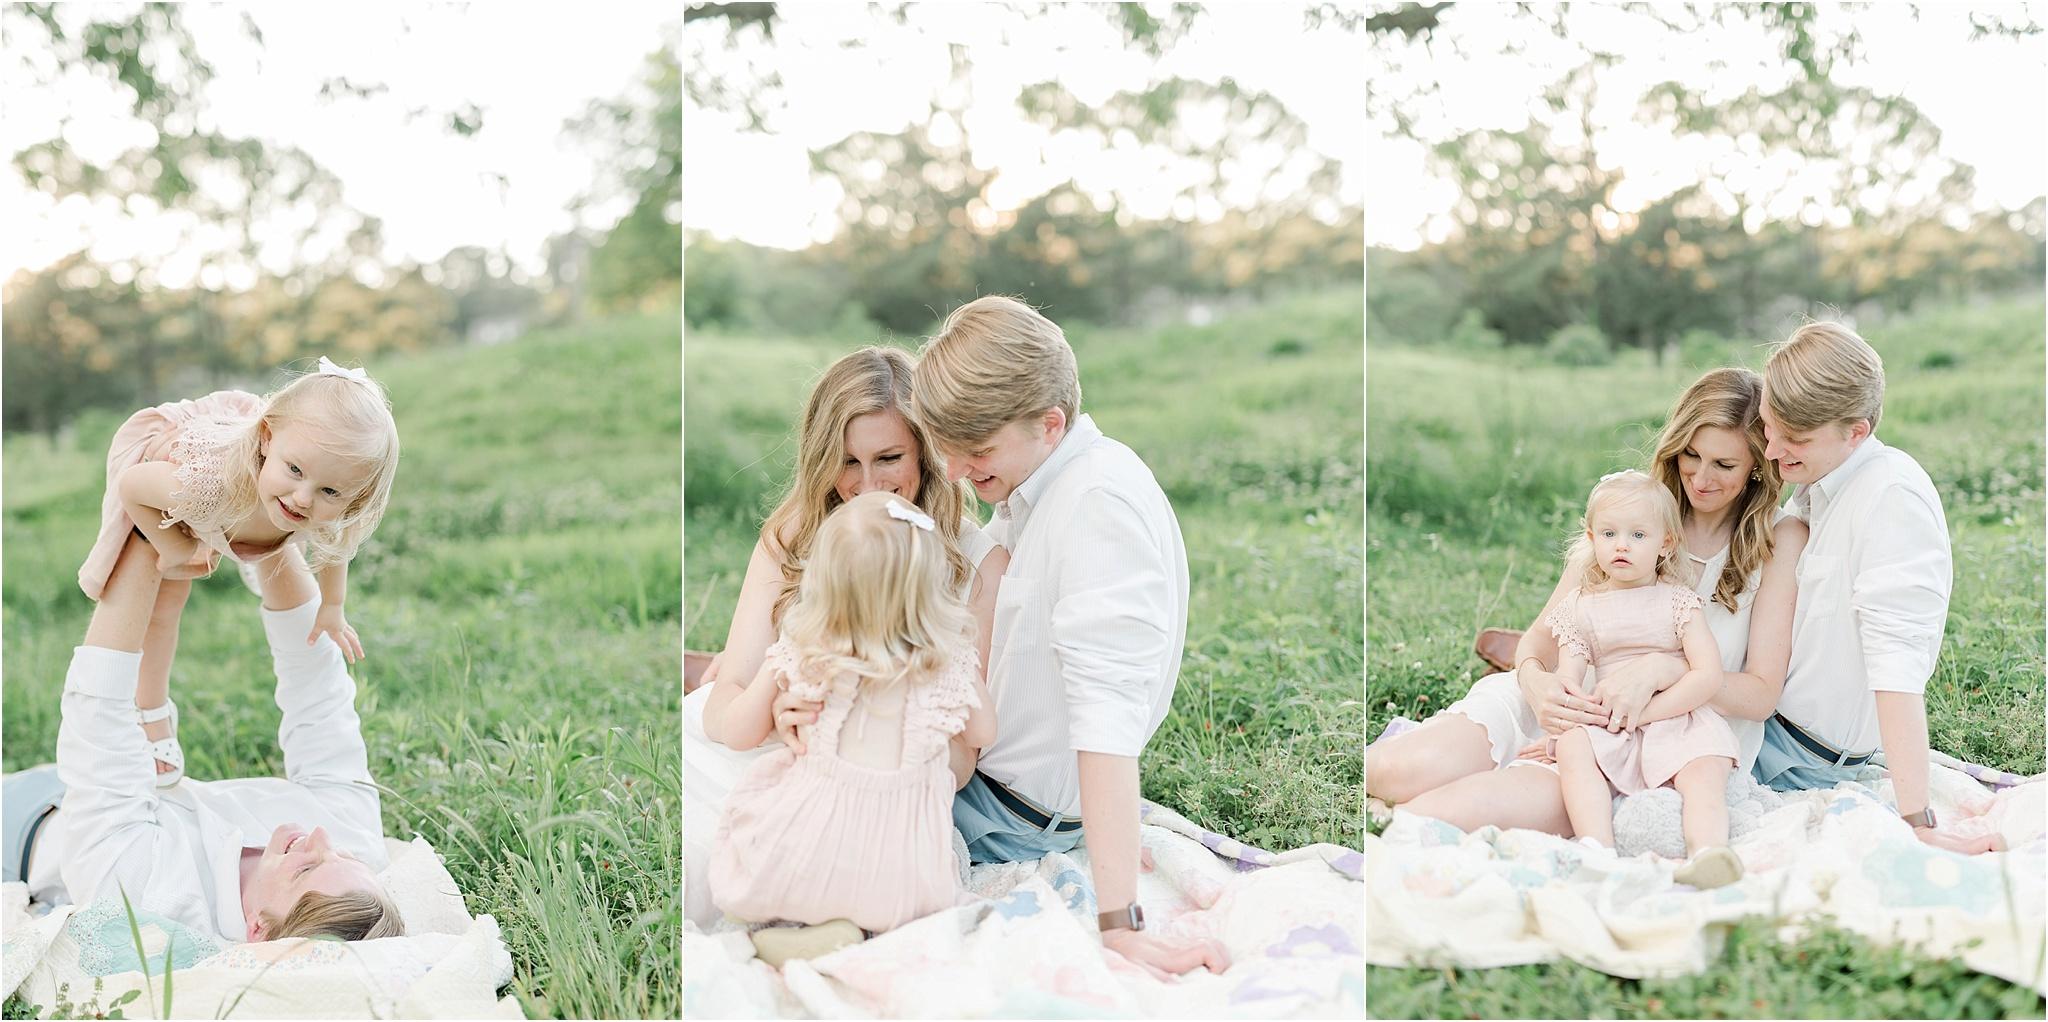 Rachel_Bond_Birmingham_AL-family-photography_0015.jpg